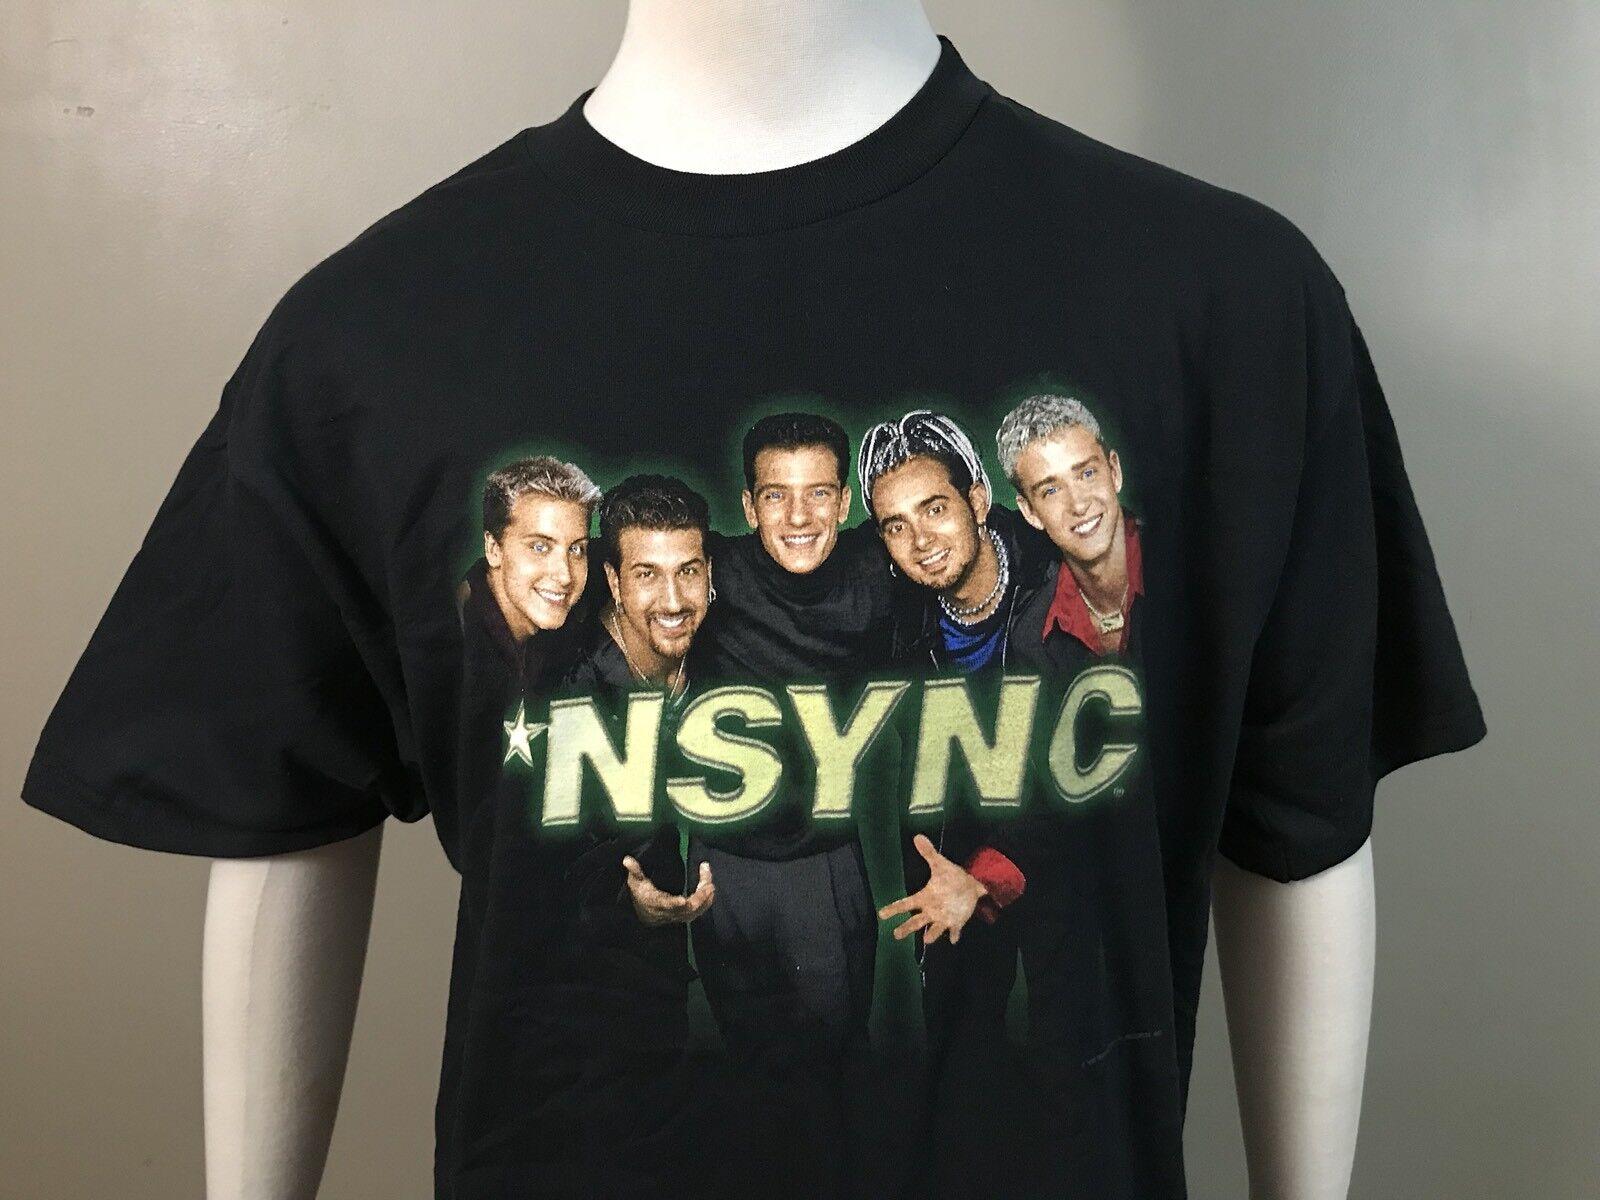 NEW VTG 1998 NSYNC BAND CONCERT TOUR SHIRT Sz L DOUBLE SIDED JUSTIN TIMBERLAKE